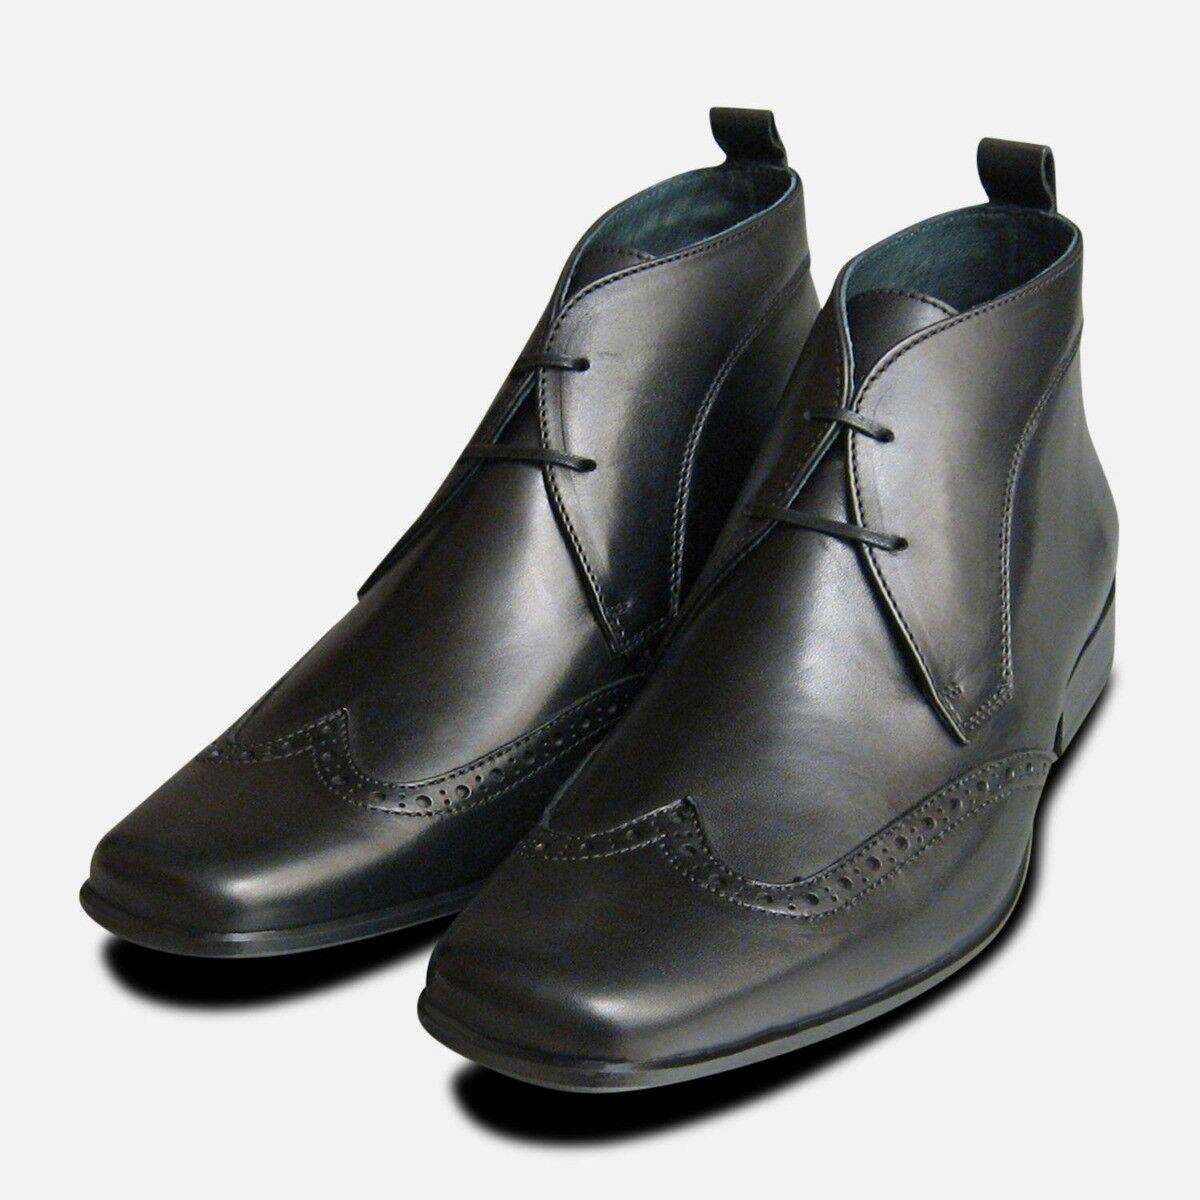 Wingcap Exceed Mens Black Chukka Boots